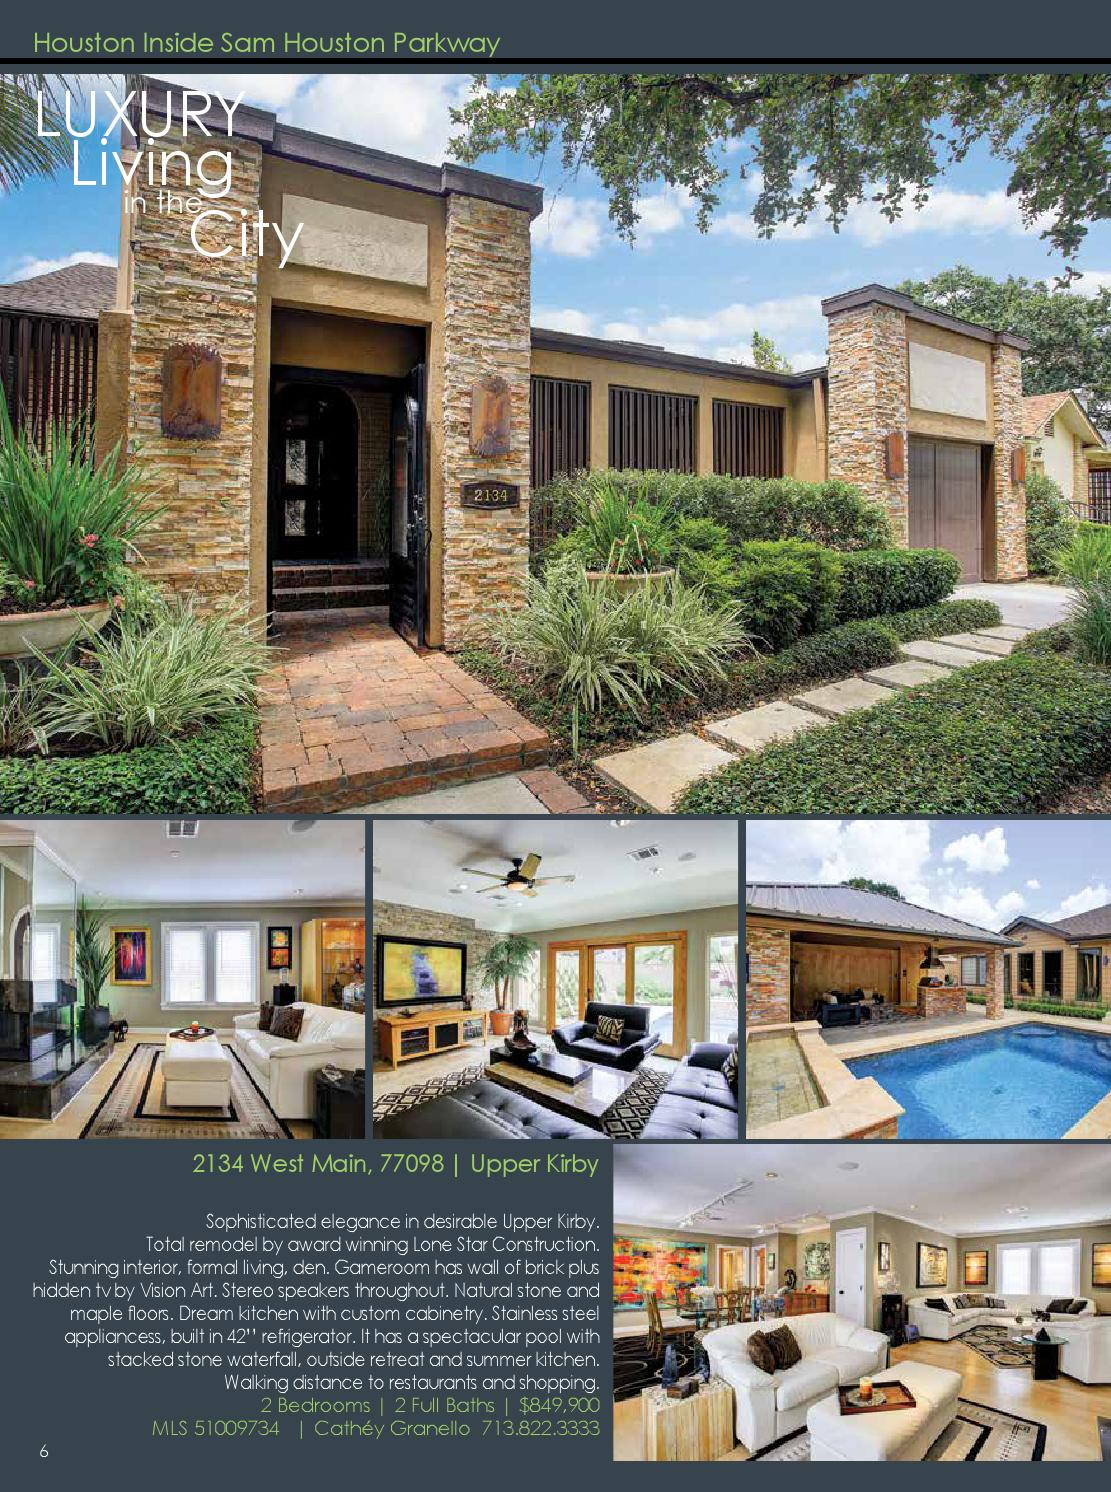 Bhgre Gary Greene Portfolio Of Luxury Homes Early Fall